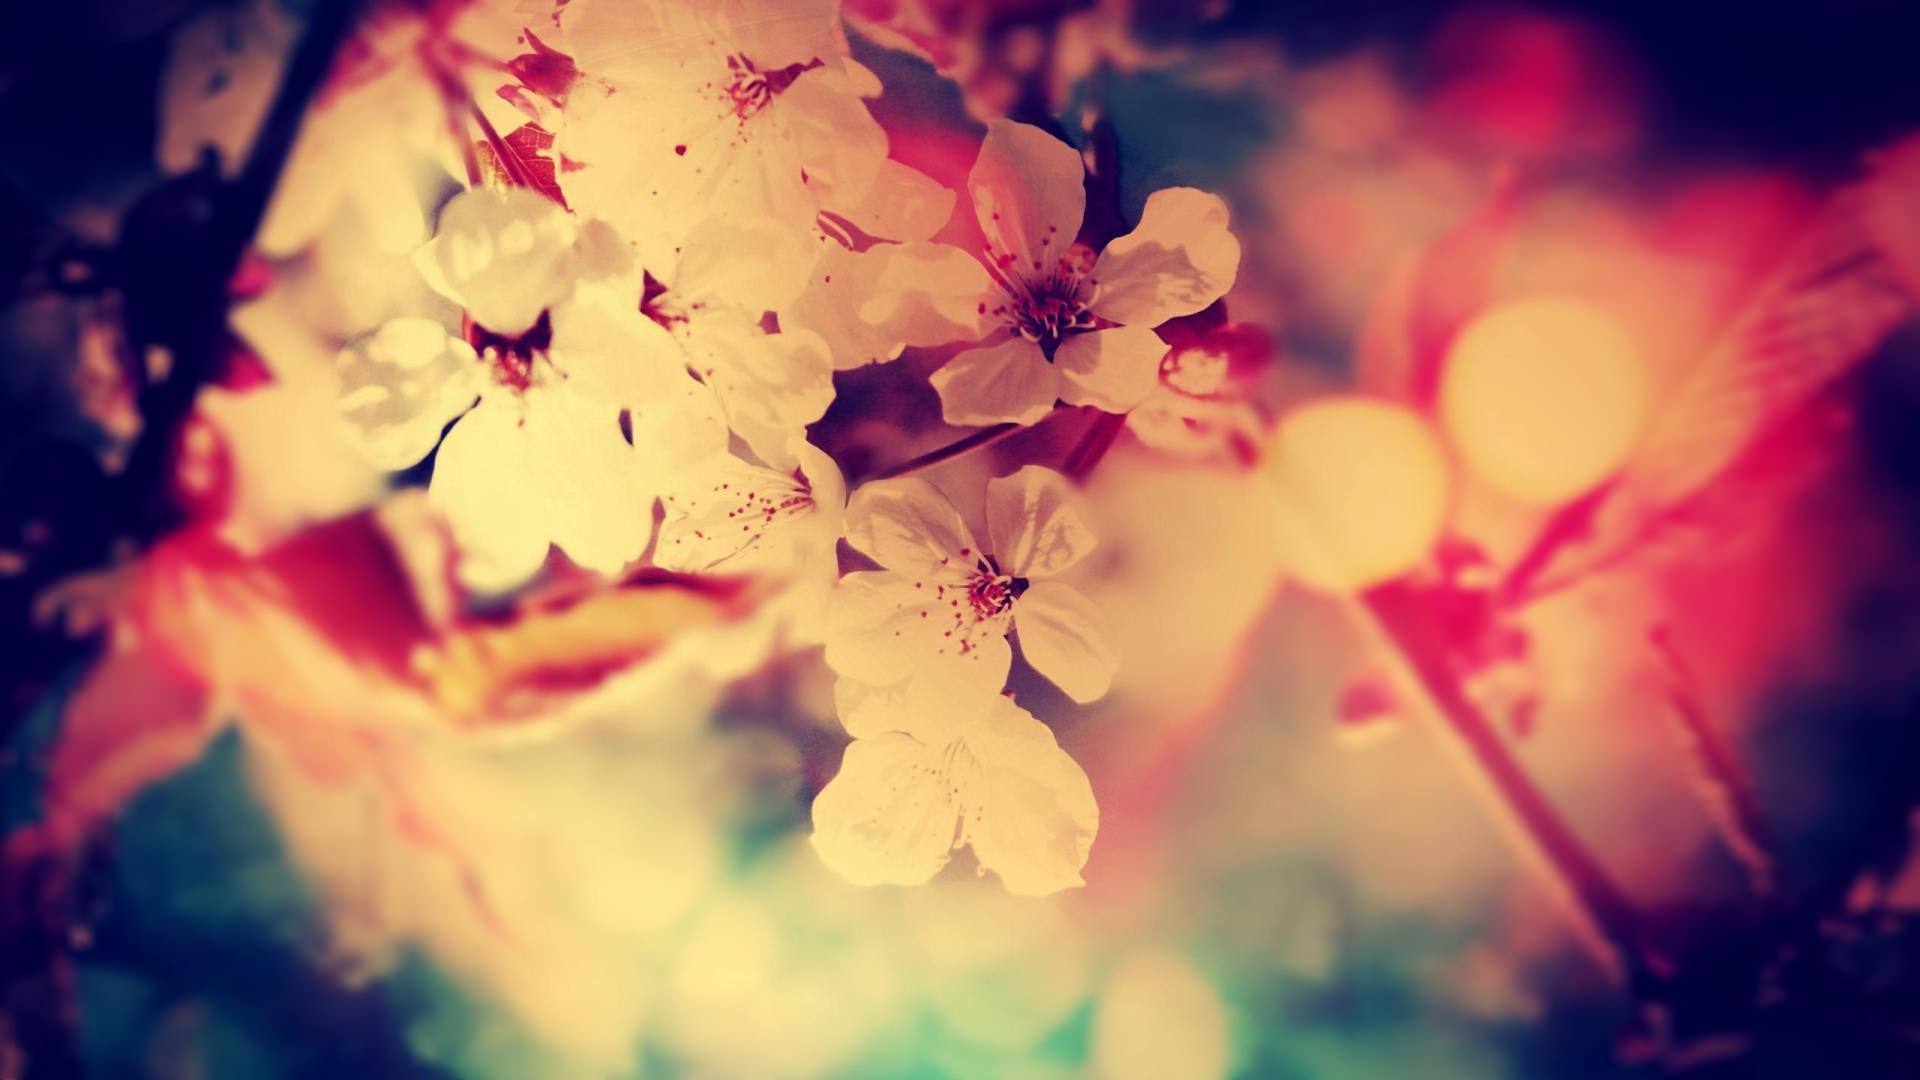 Vintage Flower Photography Backgrounds Download 20+ Free Vint...